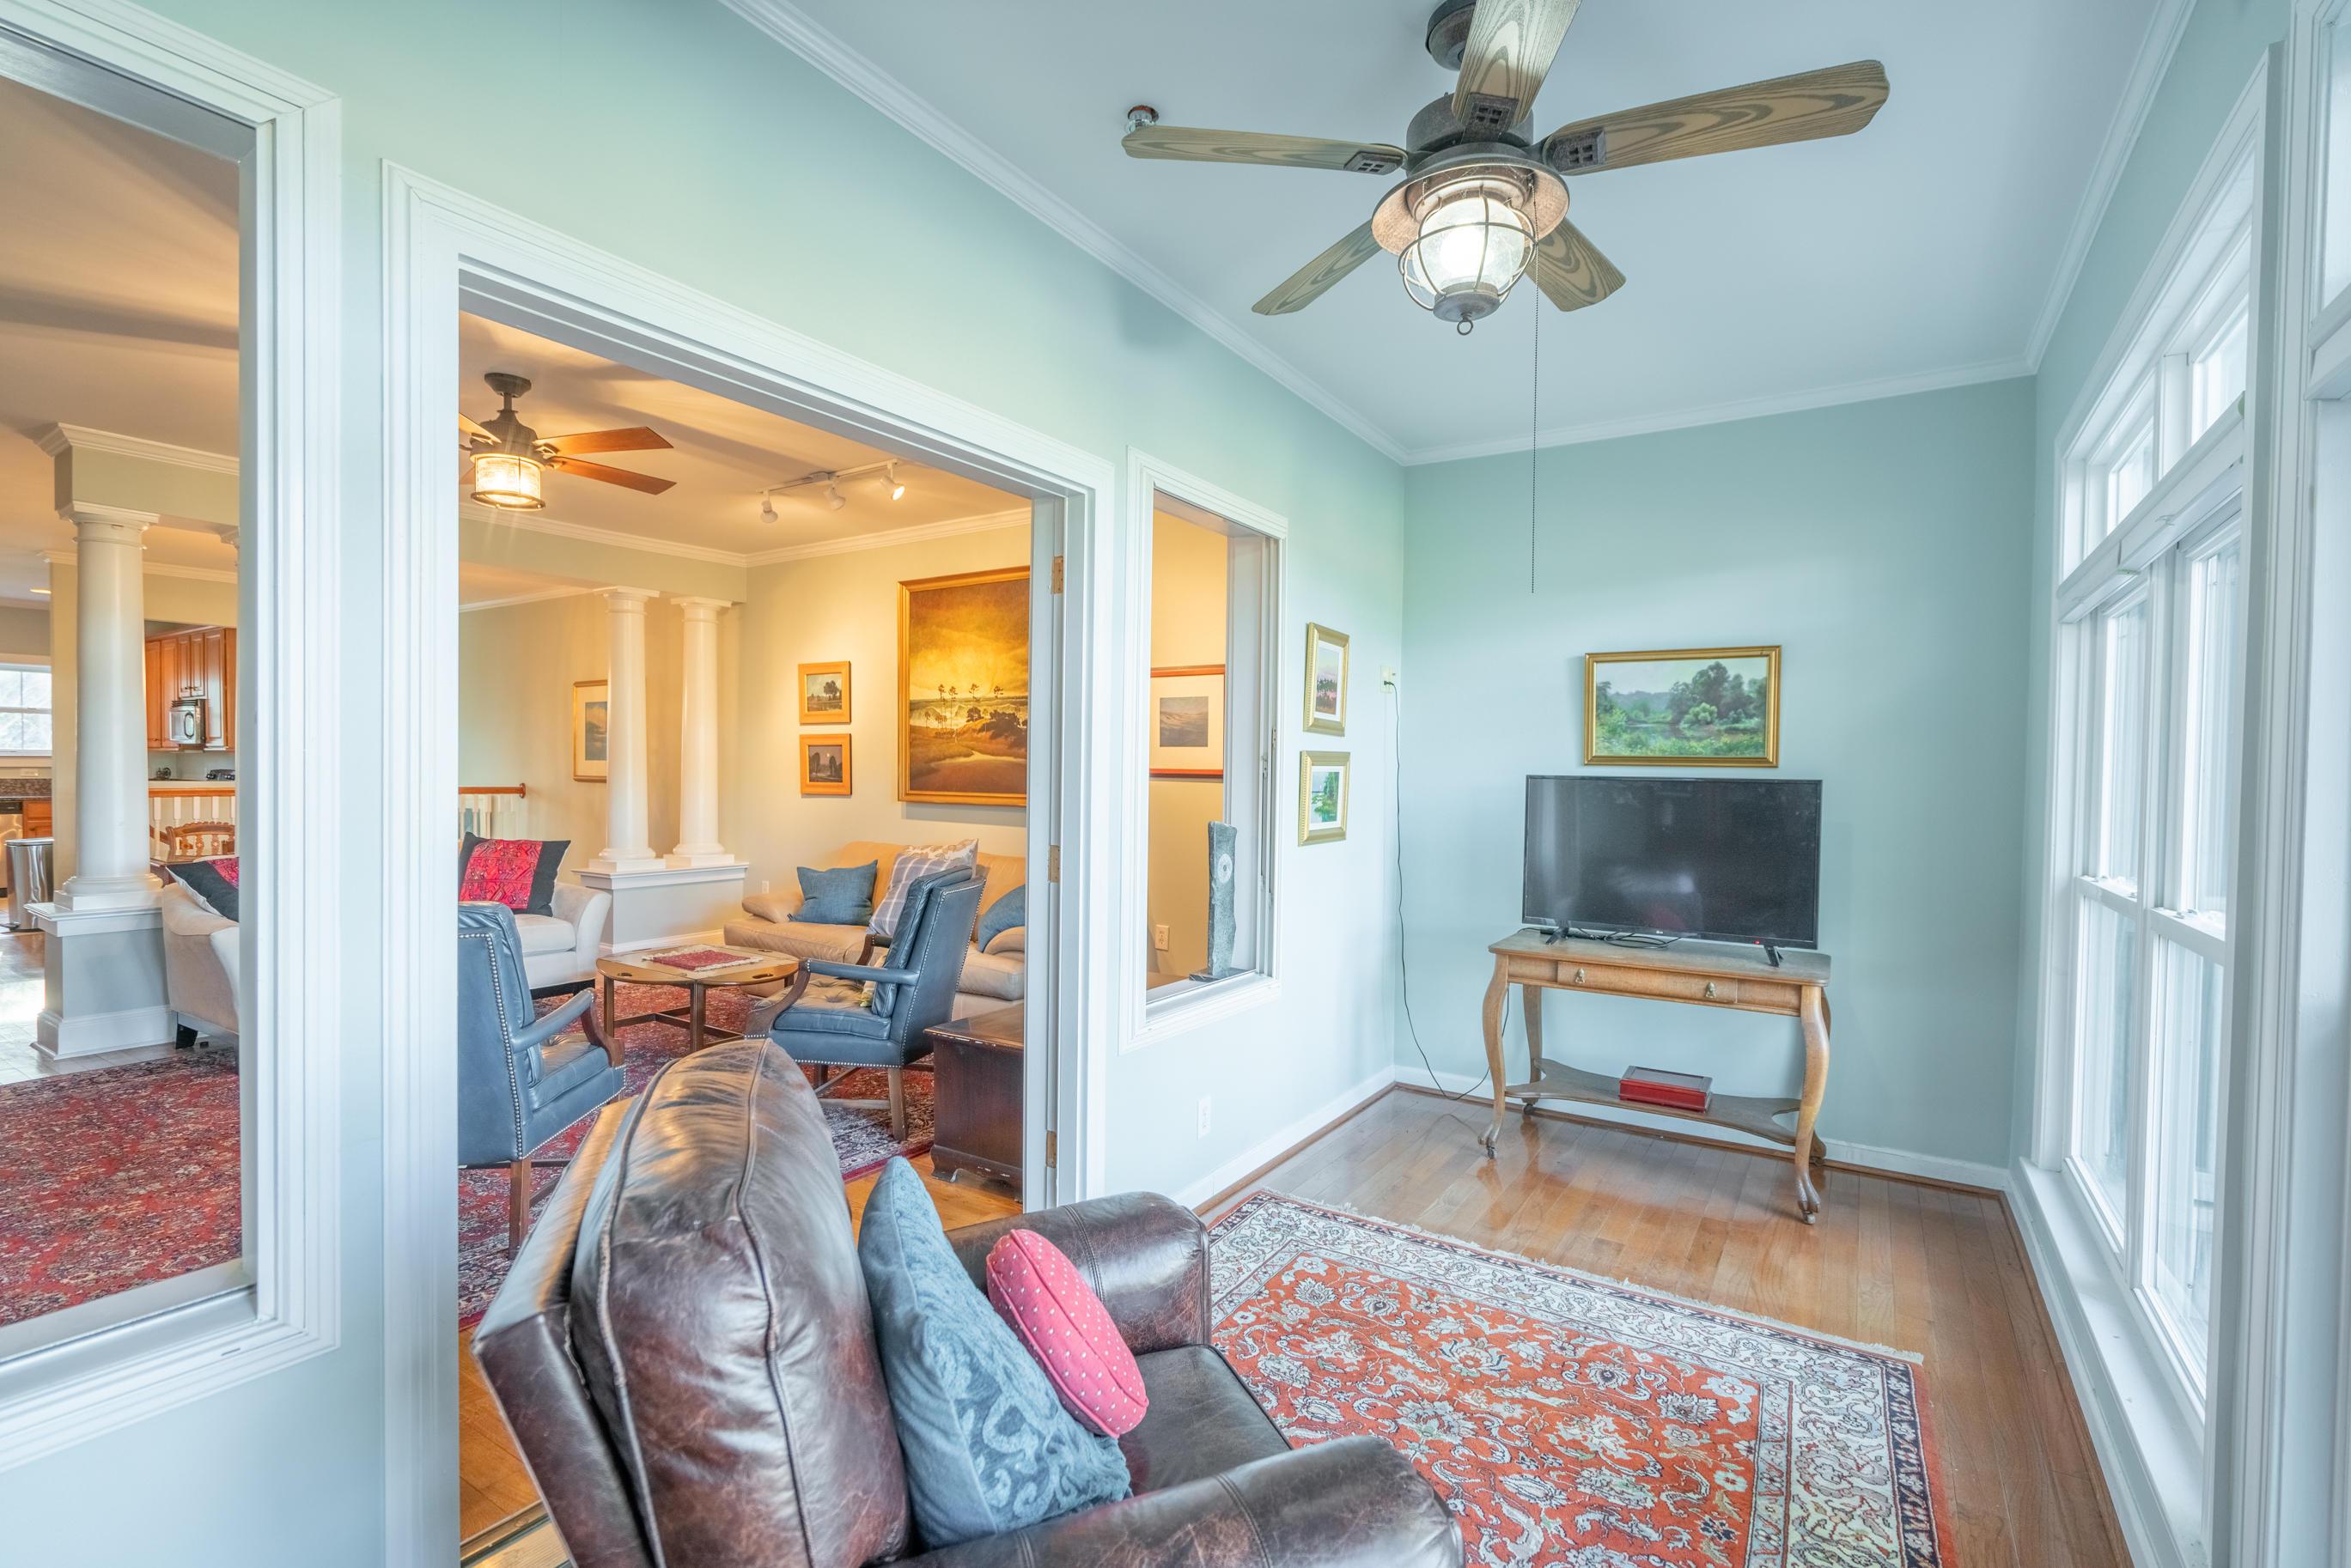 Etiwan Pointe Homes For Sale - 132 Winding Creek, Mount Pleasant, SC - 41